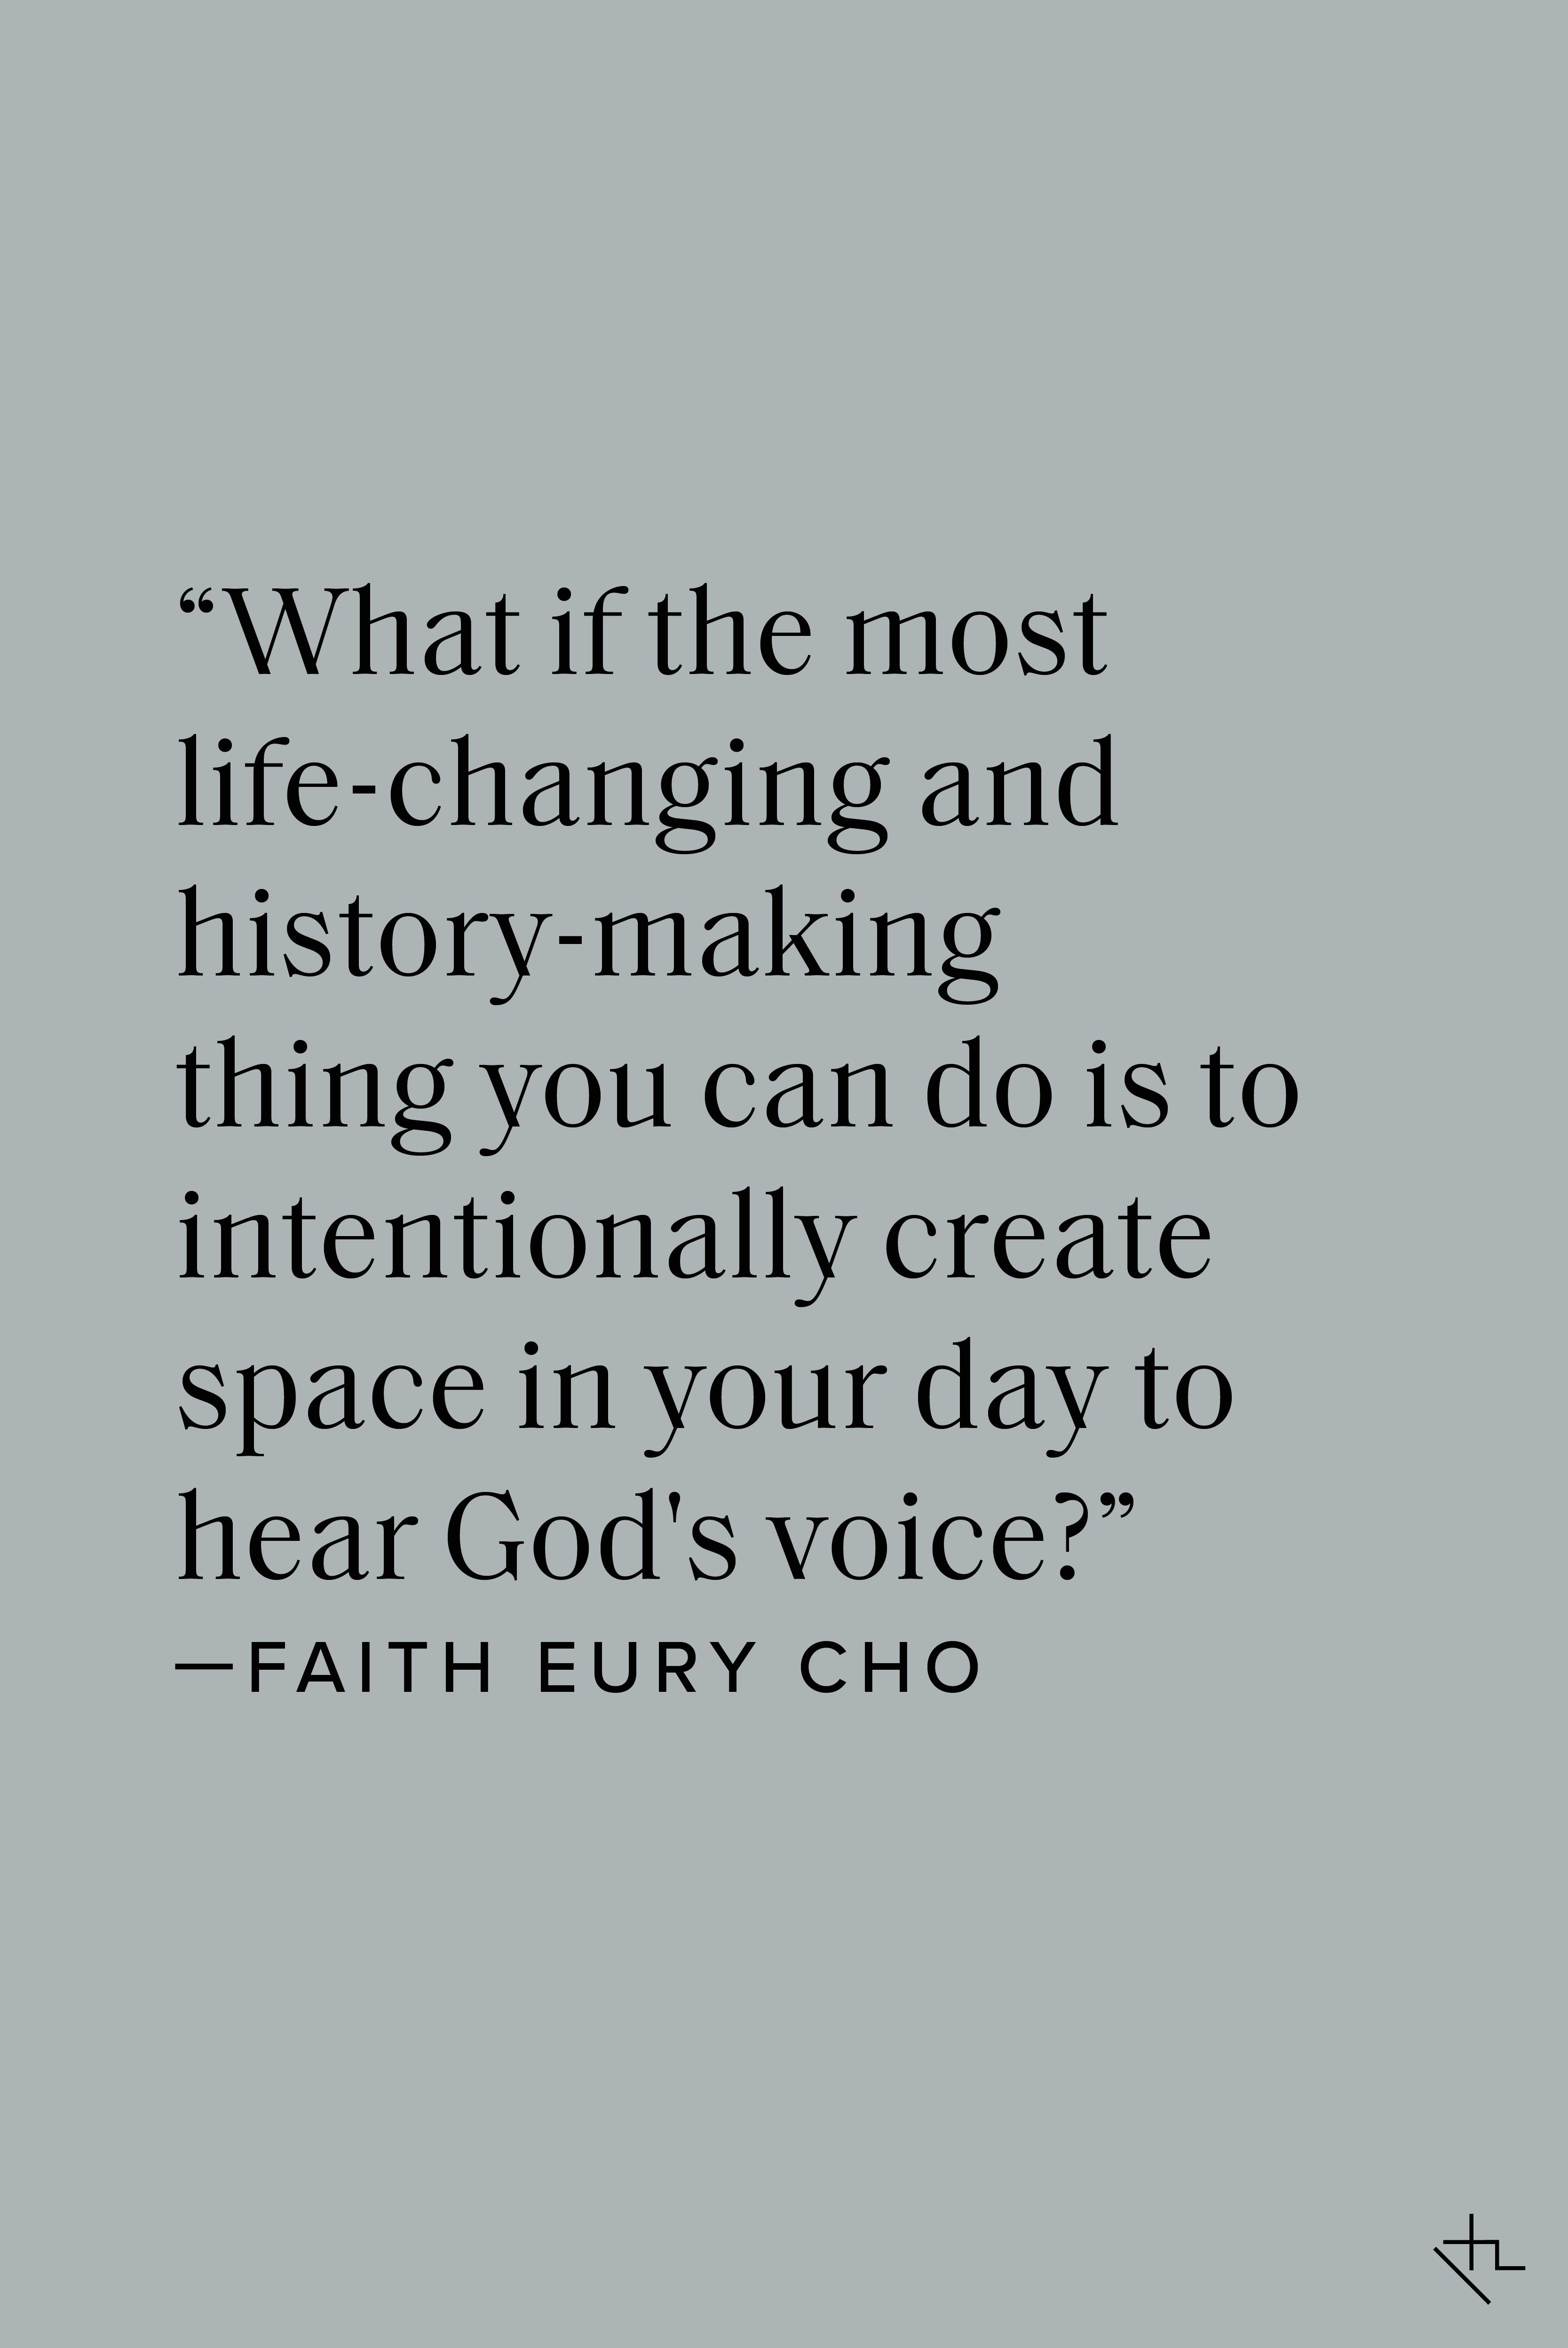 Faith Eury Cho - Pinterest Image